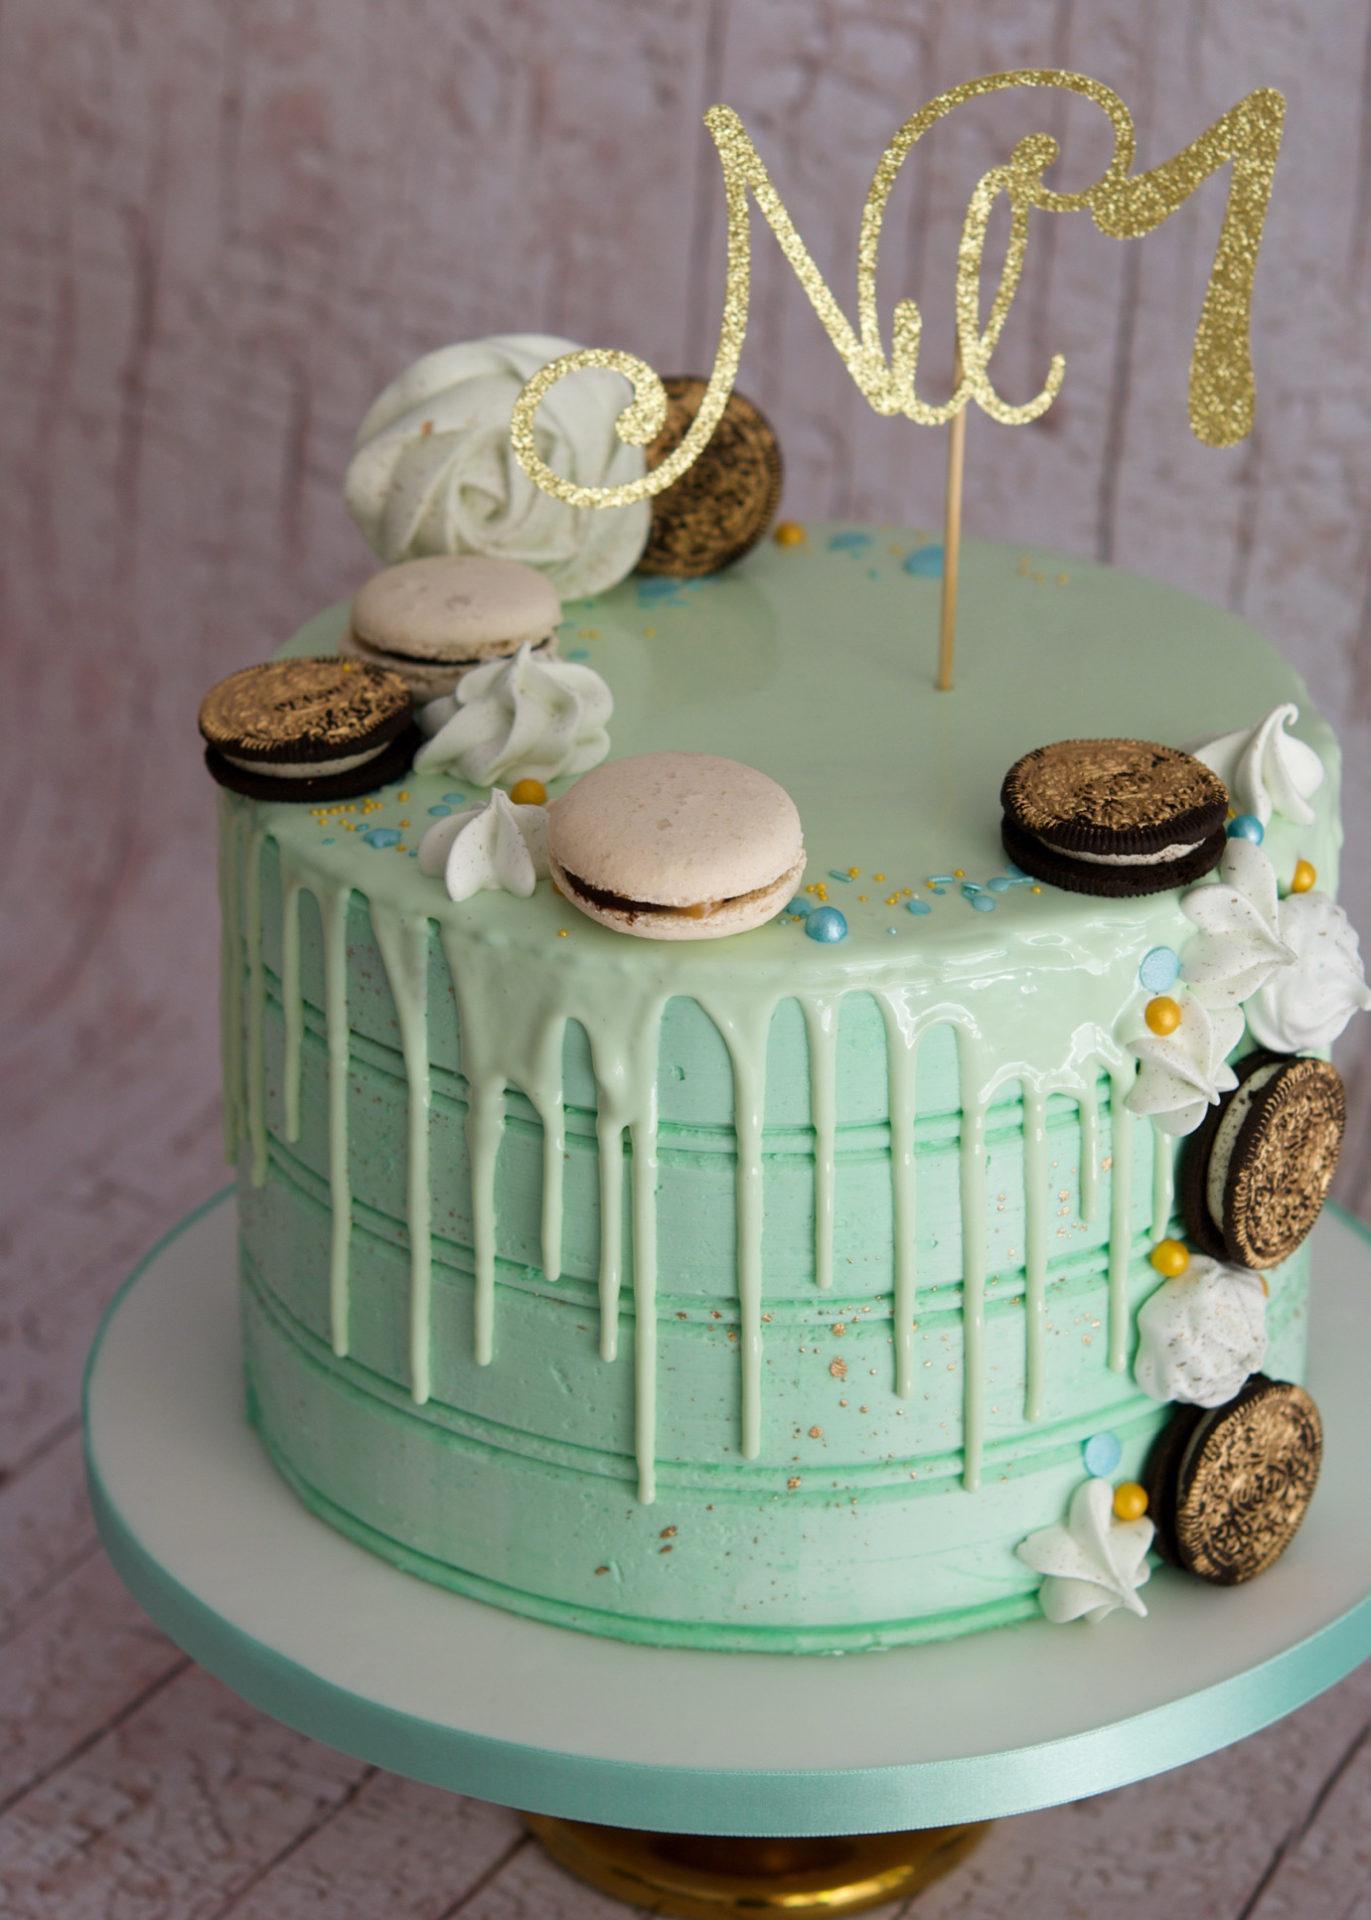 Curso Drip Cakes, Mericakes, curso reposteria, barcelona, tartas decoradas, bombones, chocolate, 2